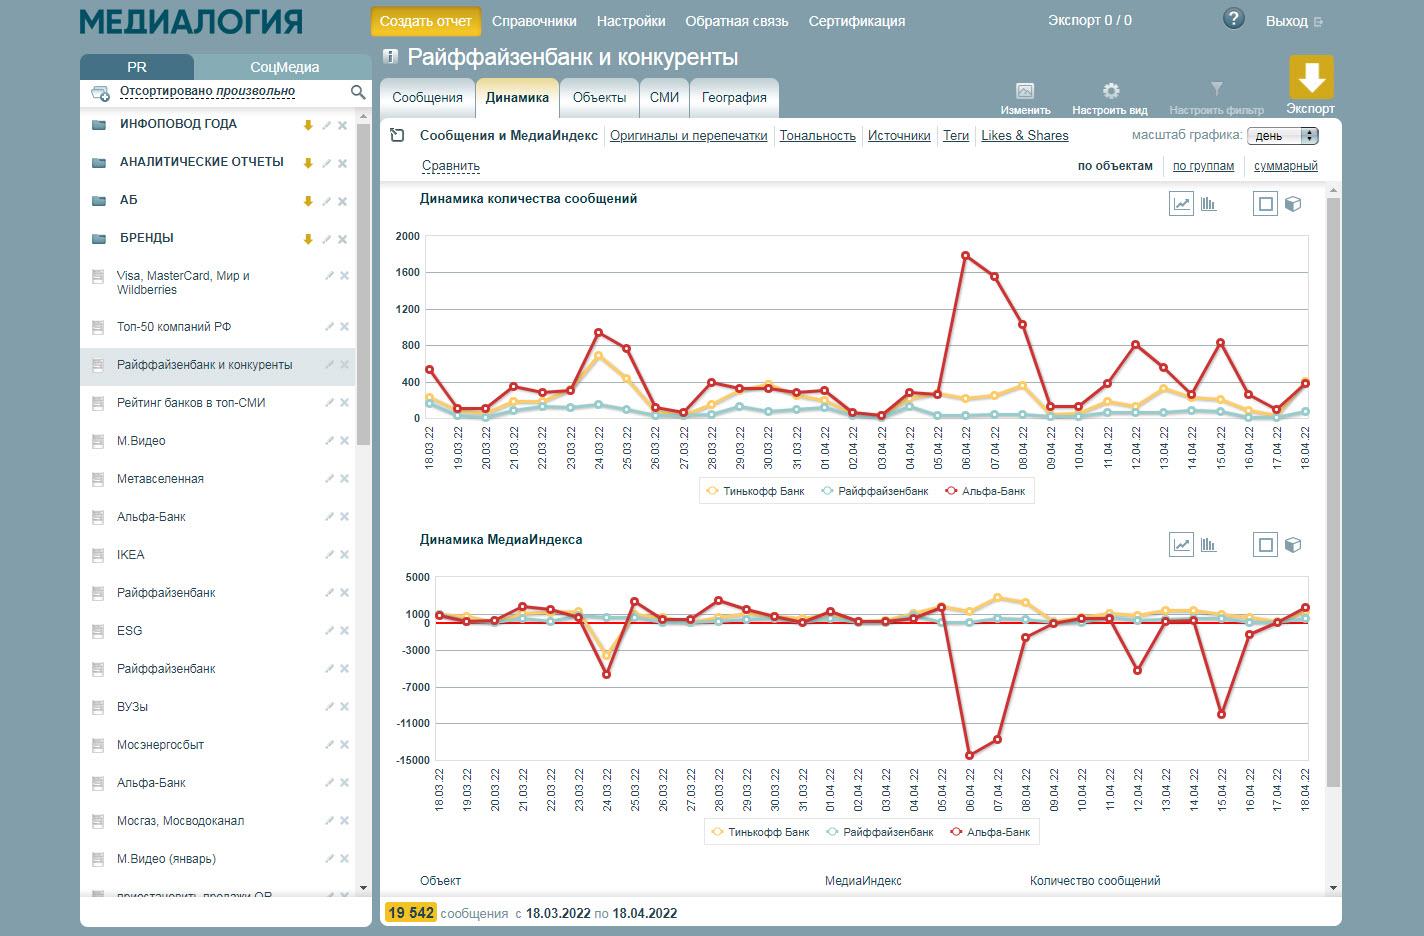 Создание мониторингового отчёта в программной системе медиа-аналитики Медиалогия Мониторинг СМИ